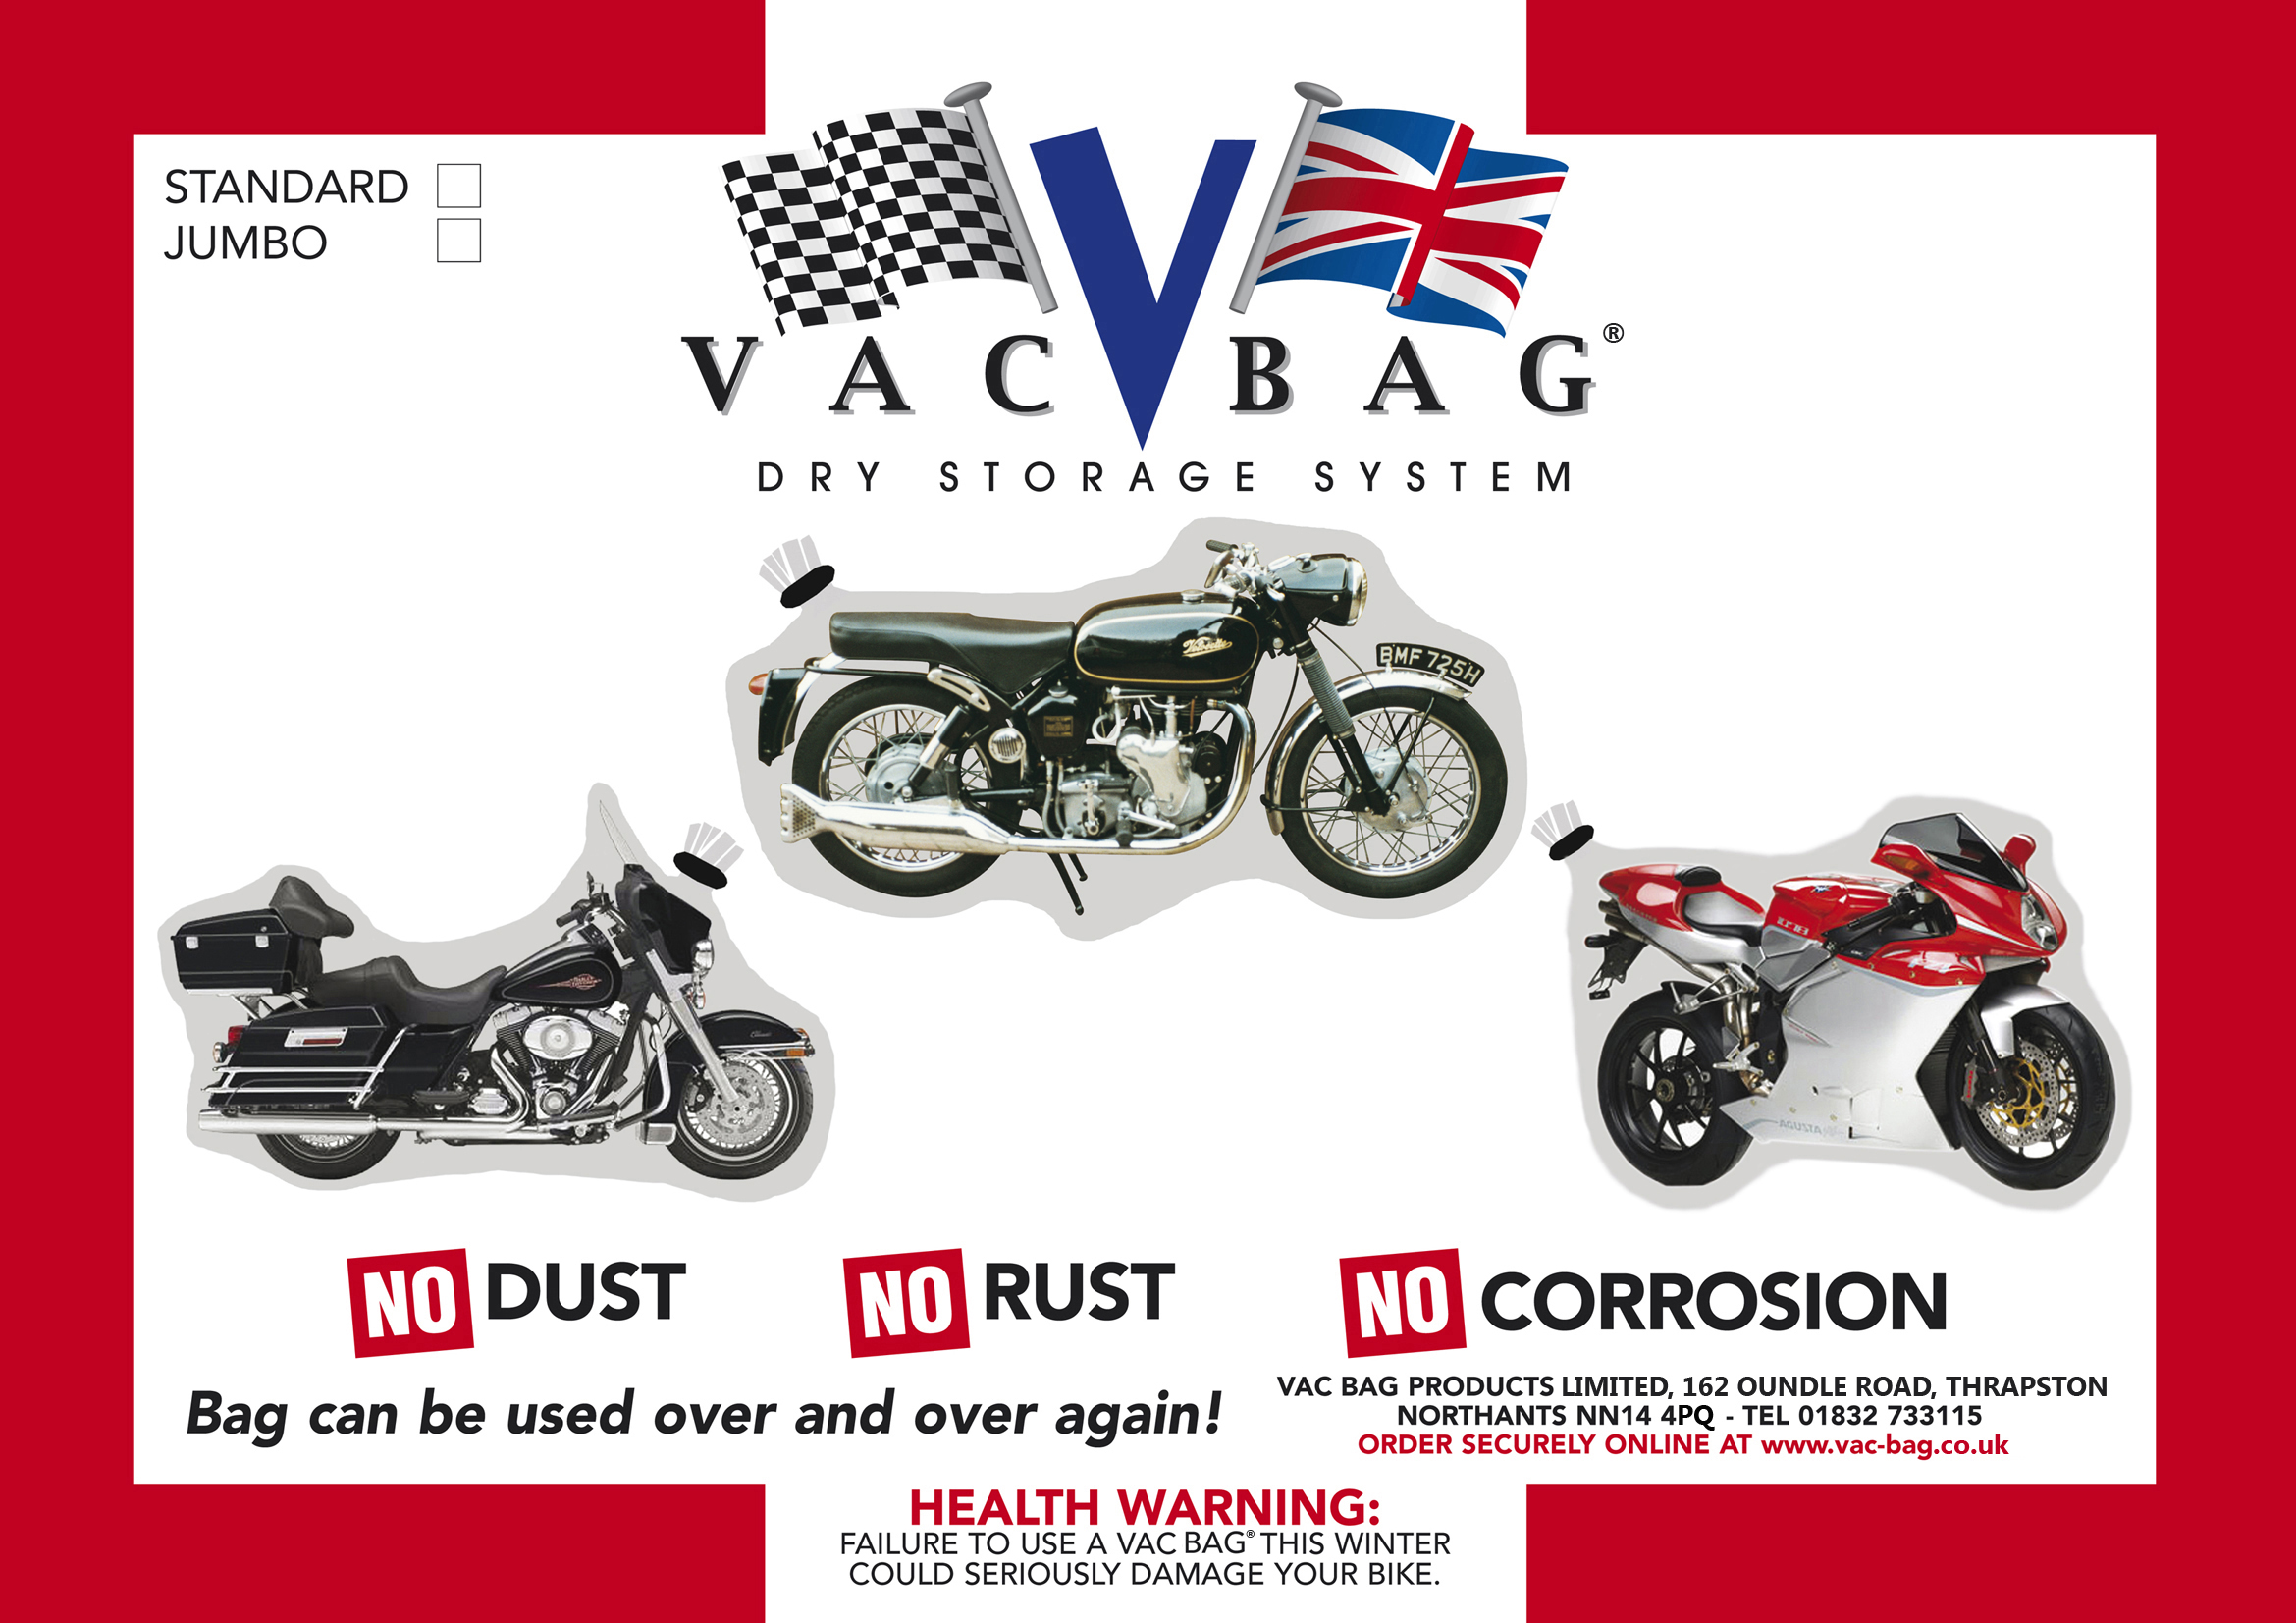 Motorcycle Bike Dry Storage Vacuum System 3.65 x 2.4m Jumbo Vac-Bag Vac Bag